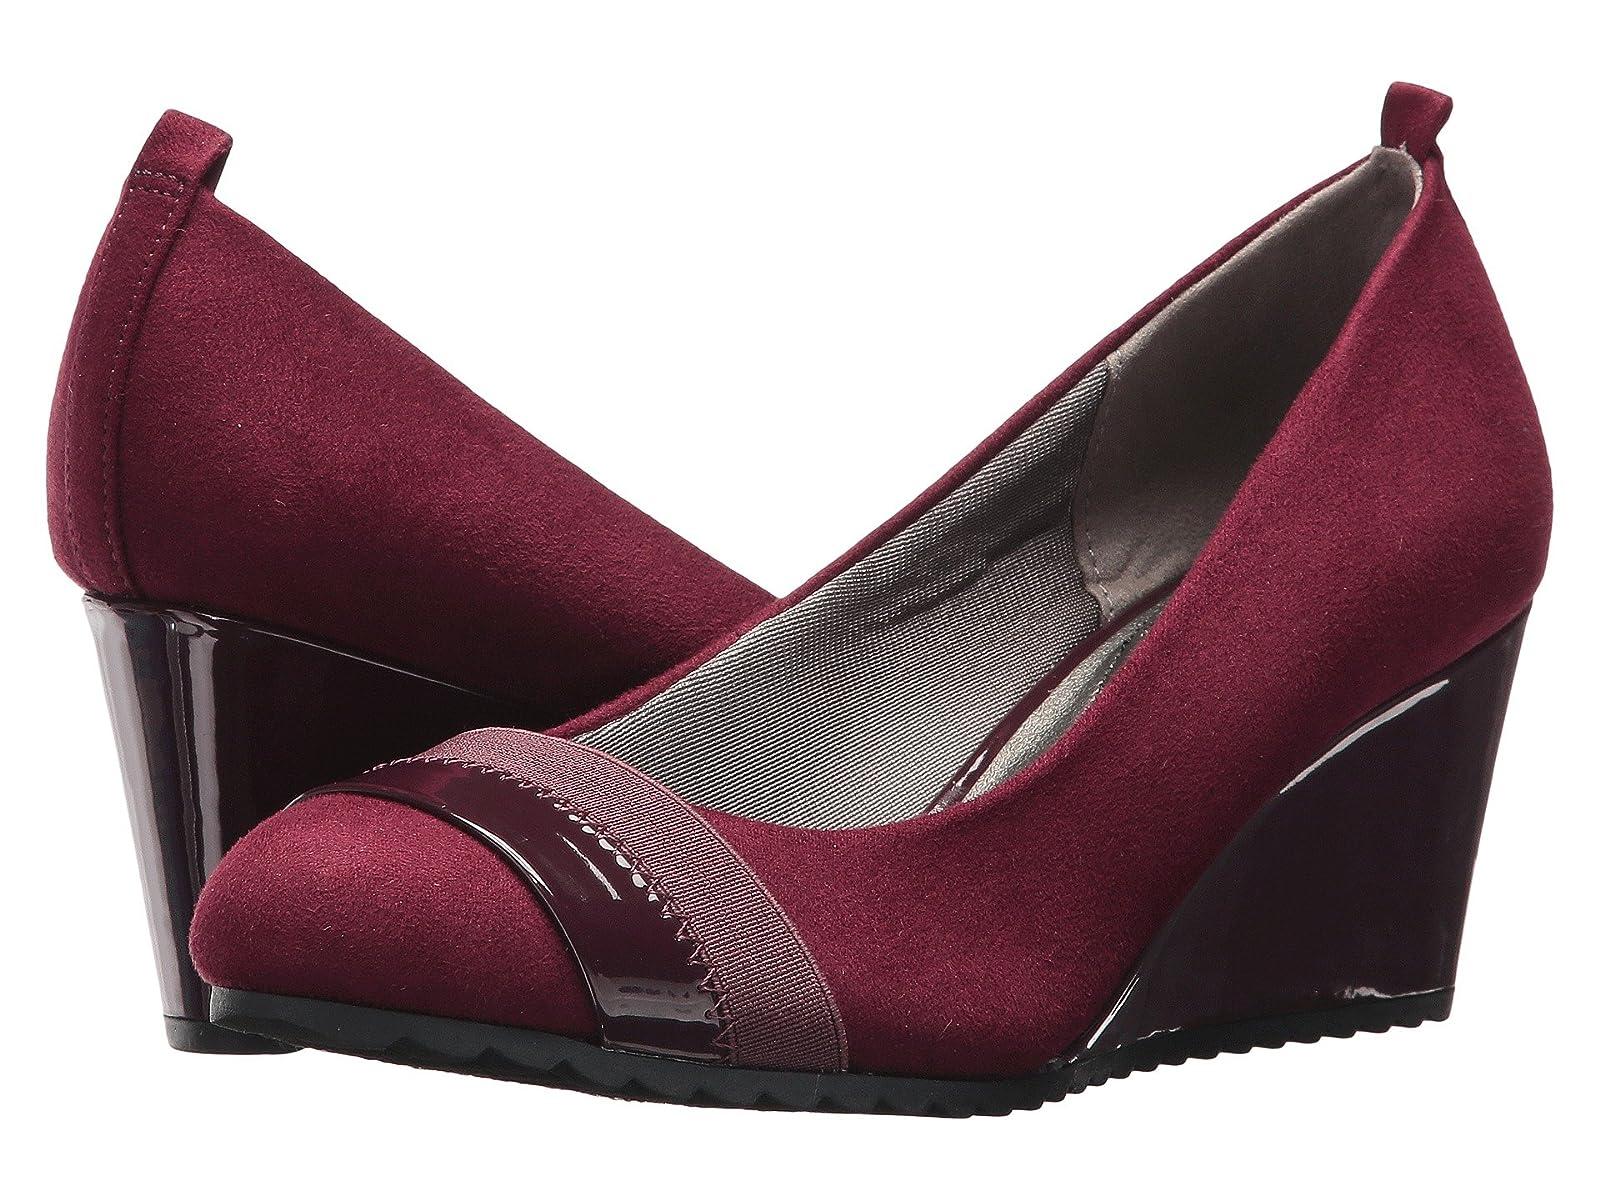 LifeStride Parigi WedgeCheap and distinctive eye-catching shoes